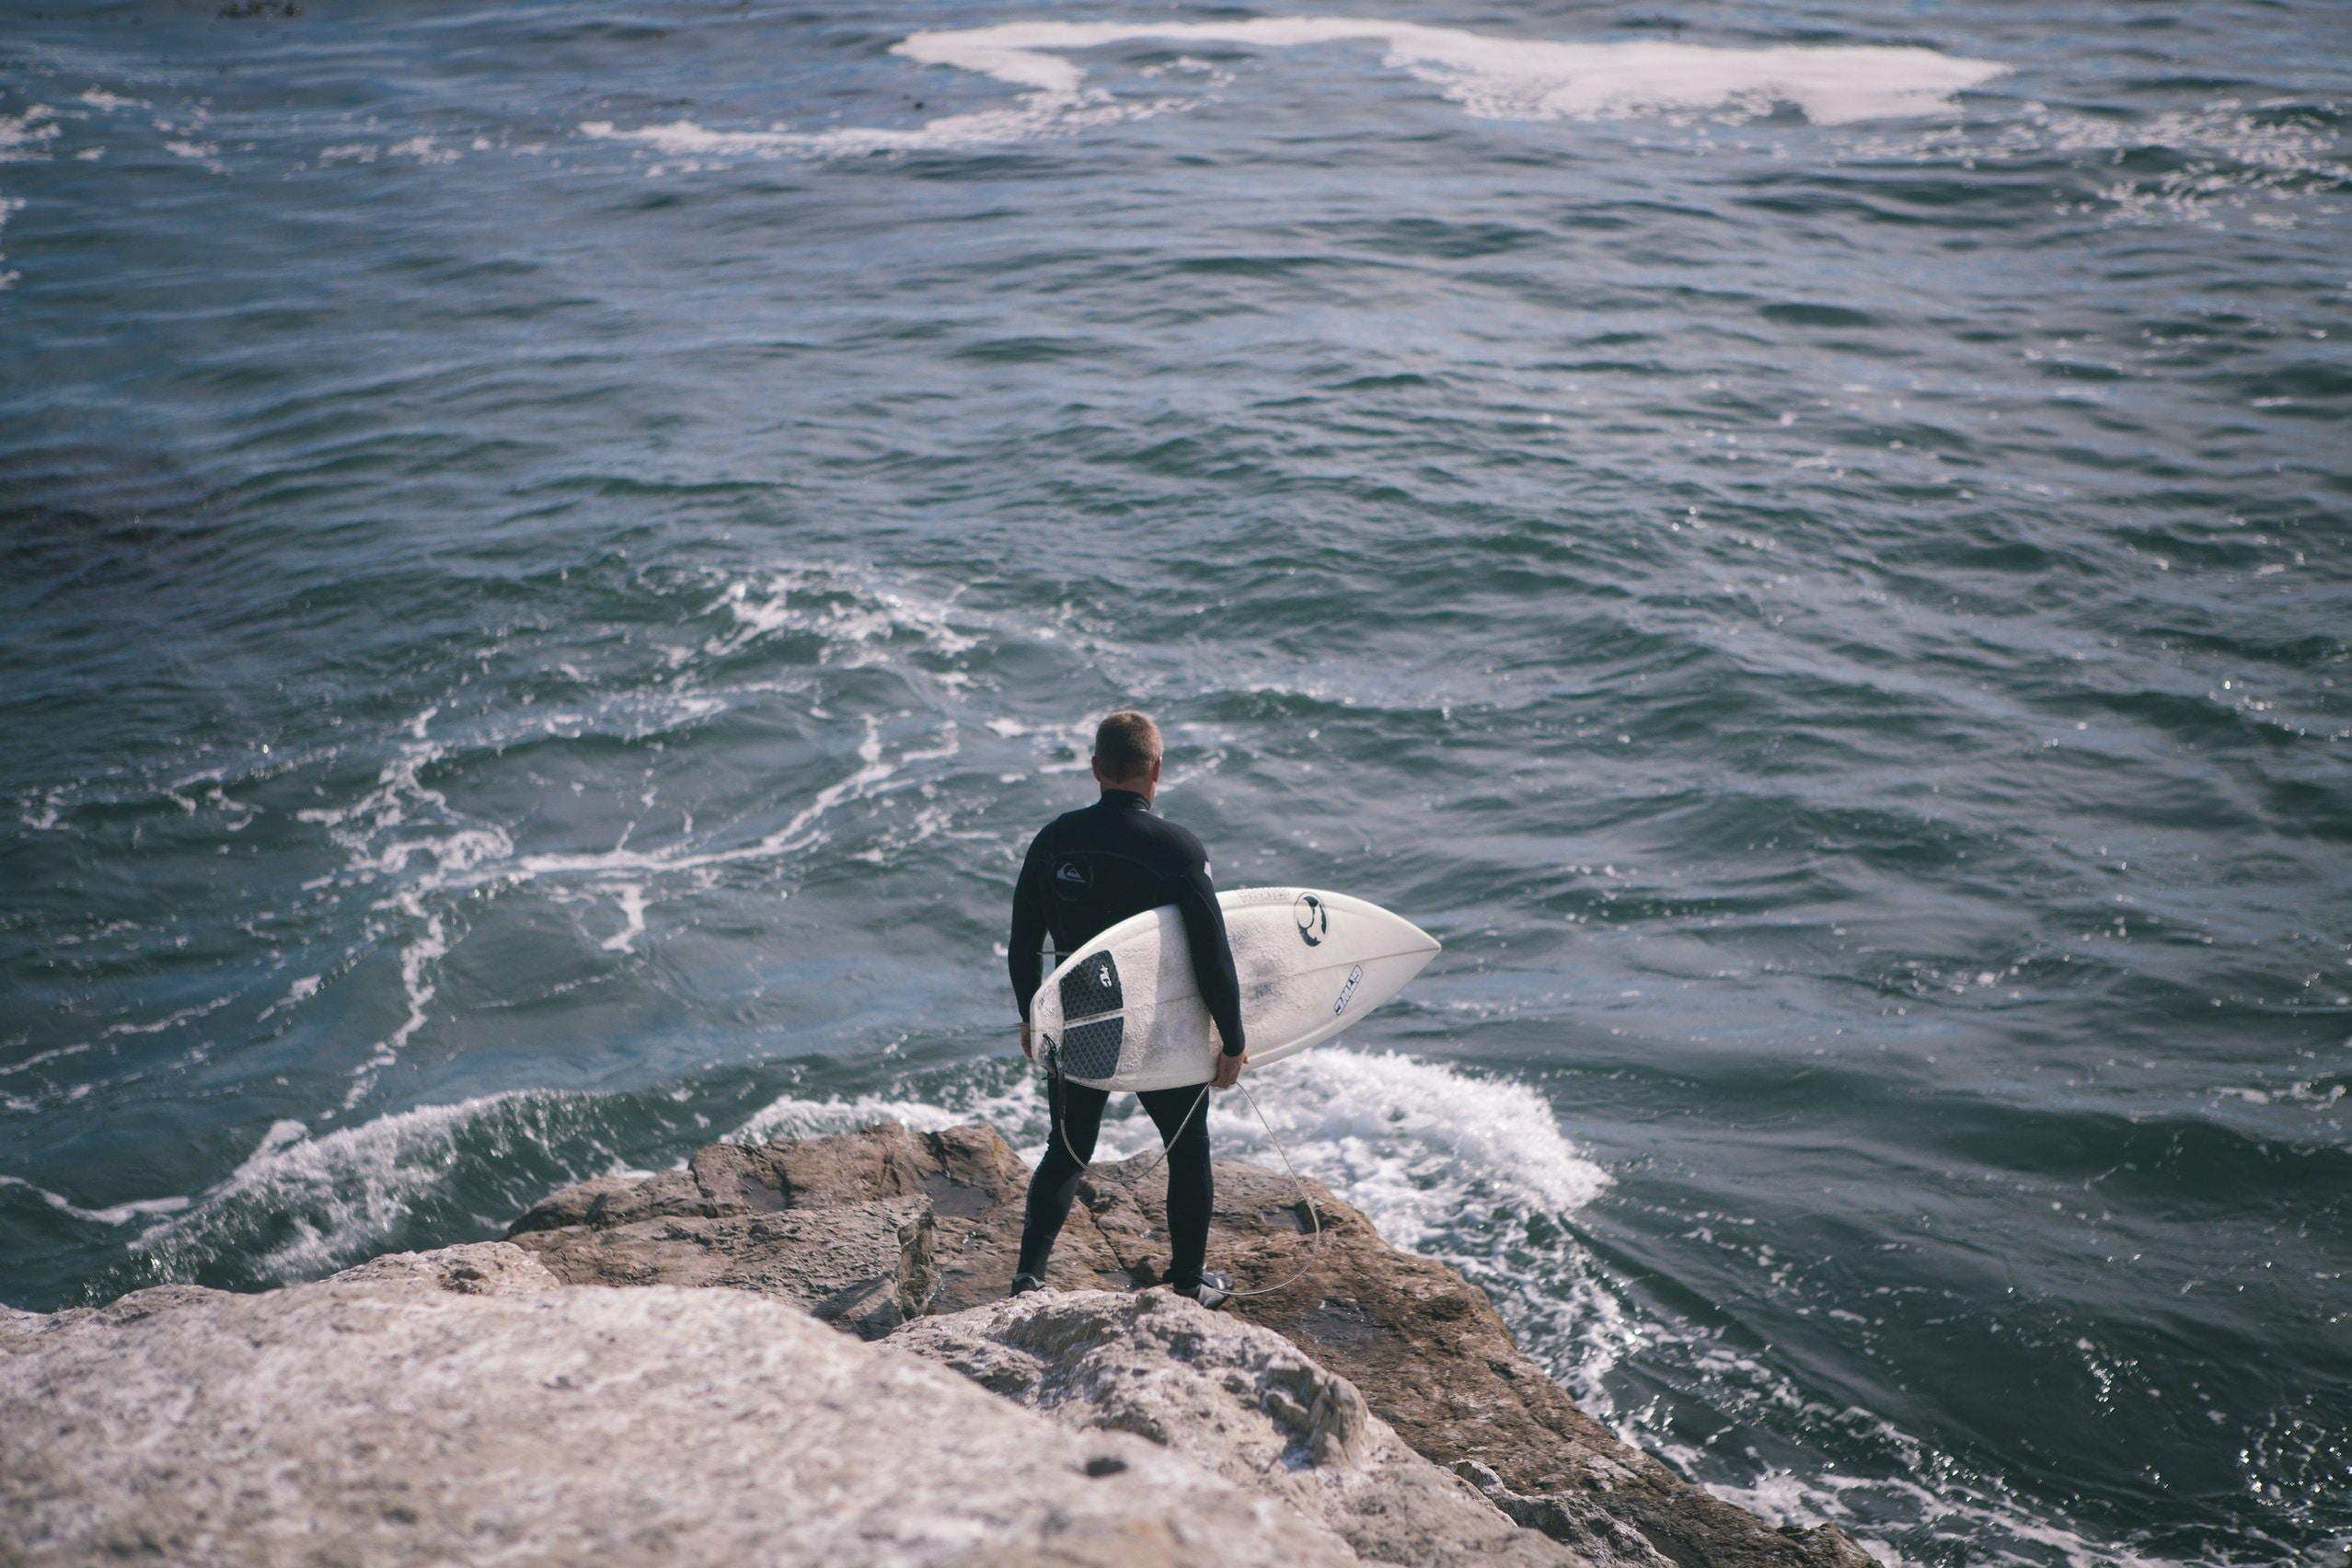 A man holding a surfboard on a rock by the ocean in Santa Cruz